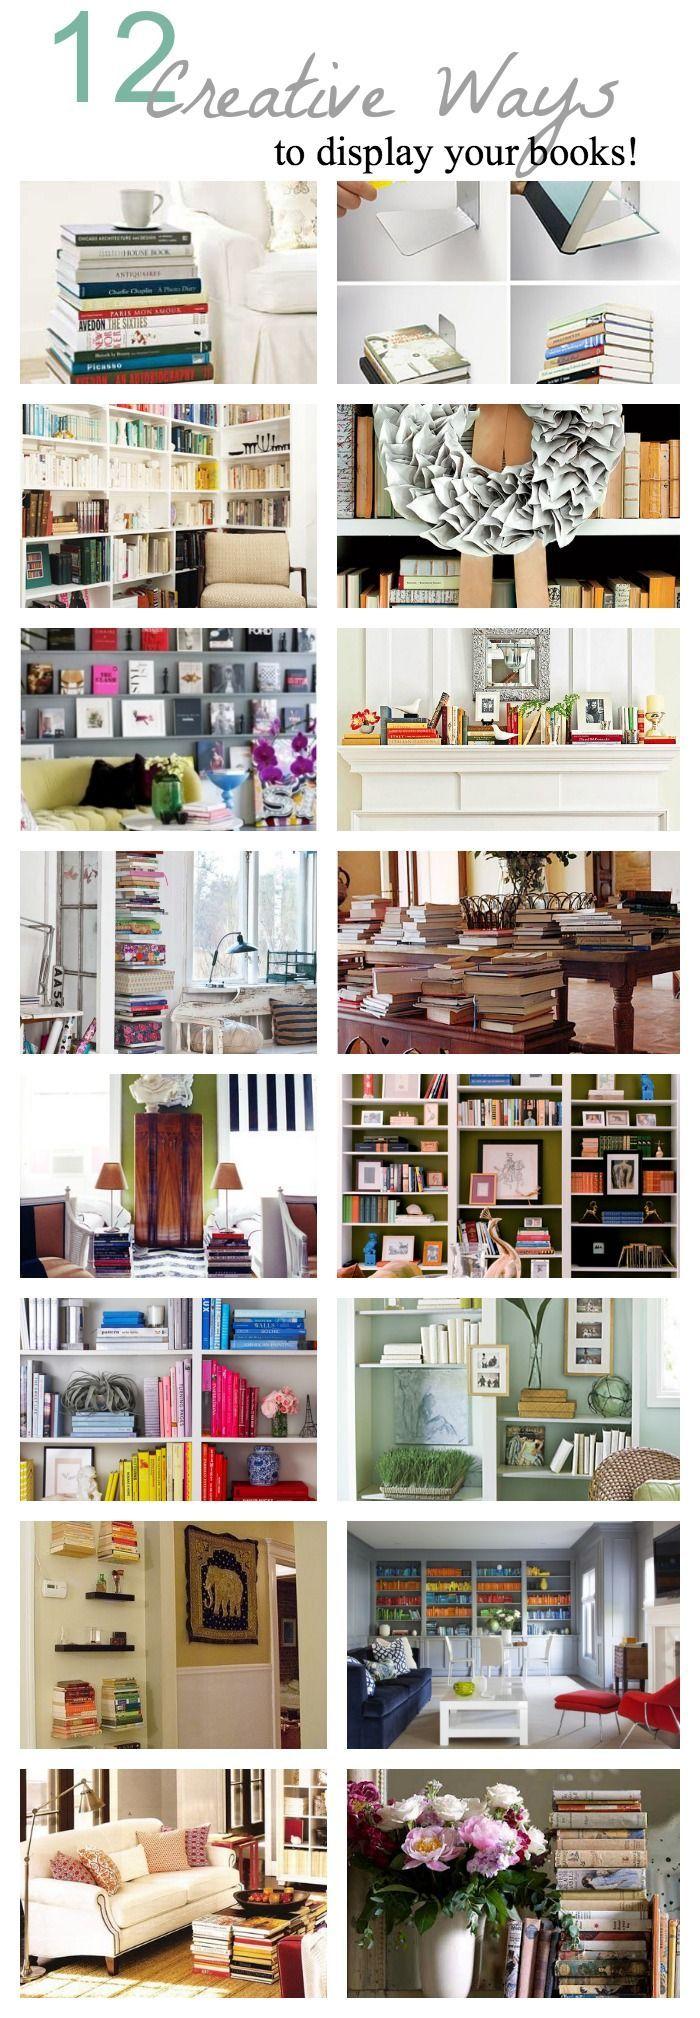 12 Creative ways to display your books!